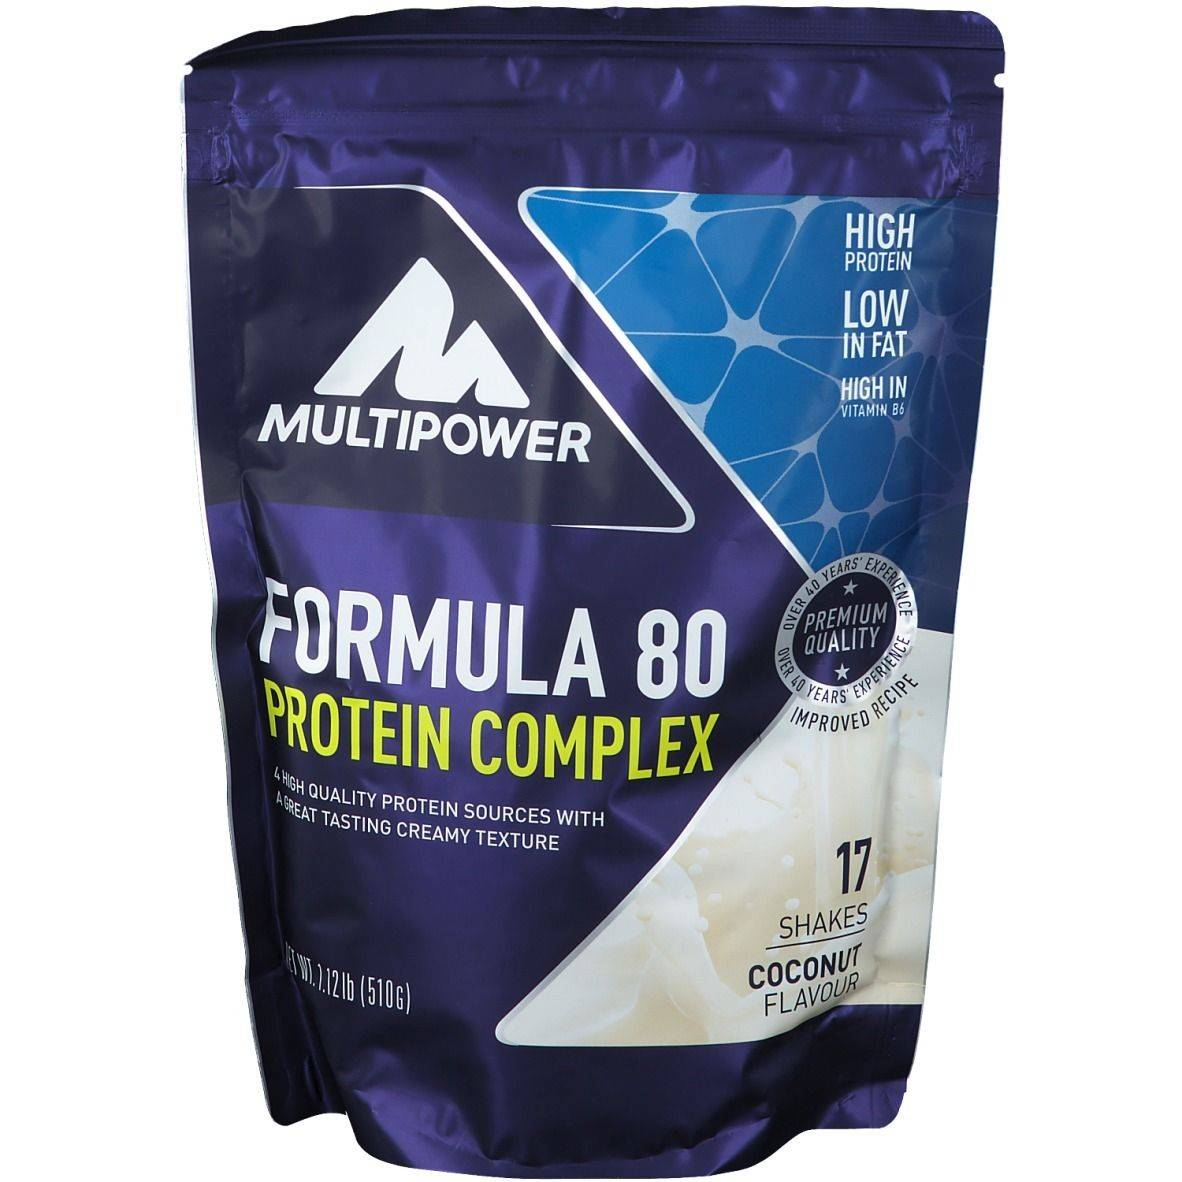 Multipower Formula 80 Protein Complex, noix de coco g poudre